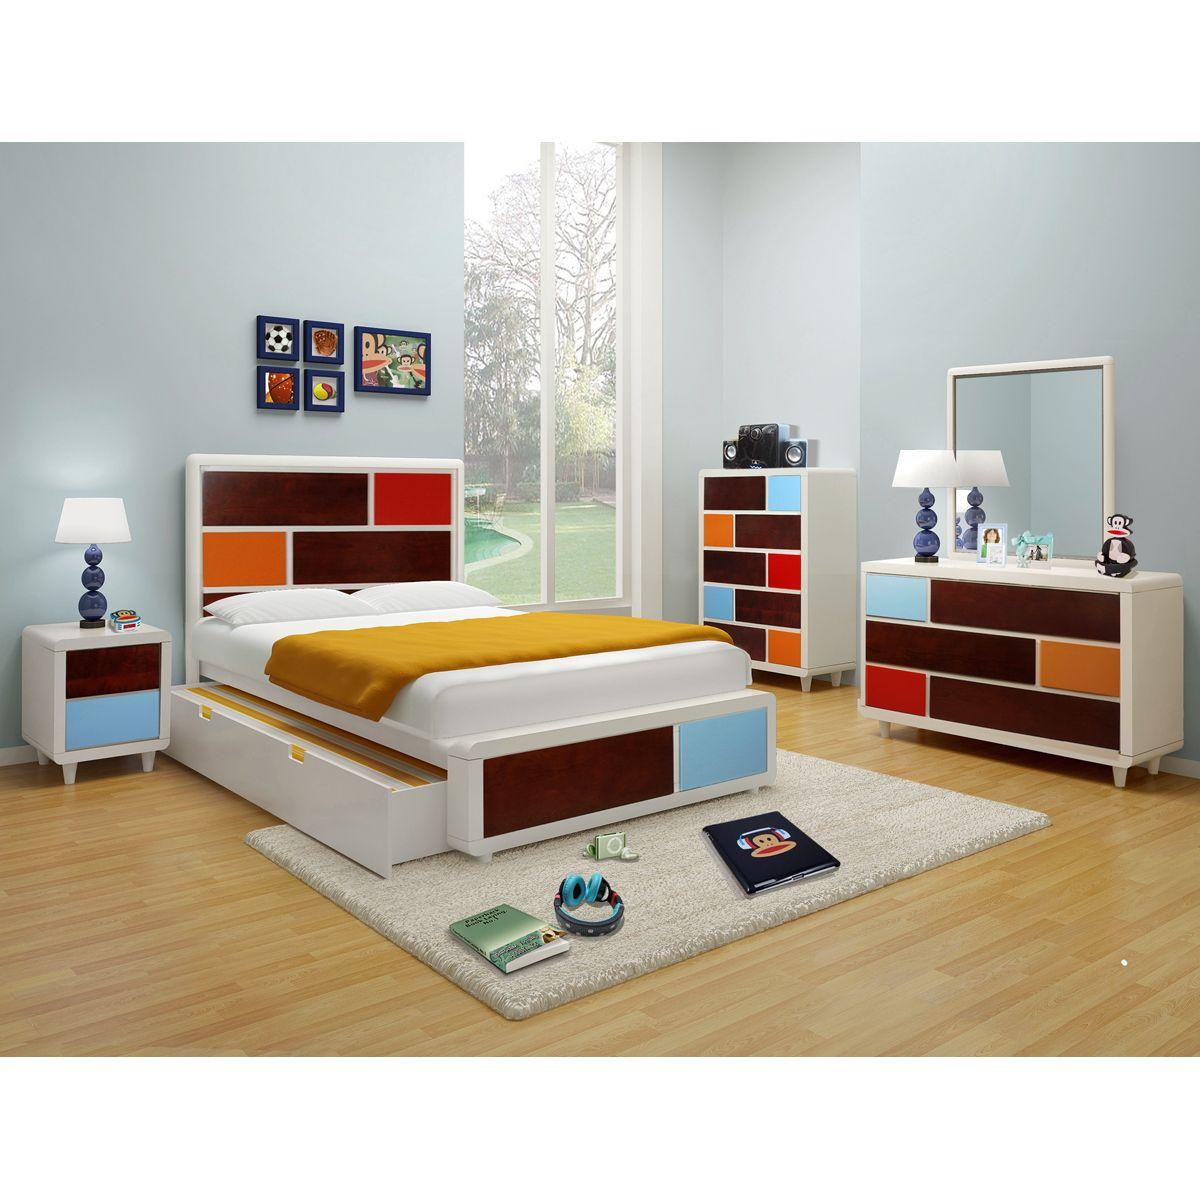 Alex\'s Room - Brown option not white | Home decor | Pinterest